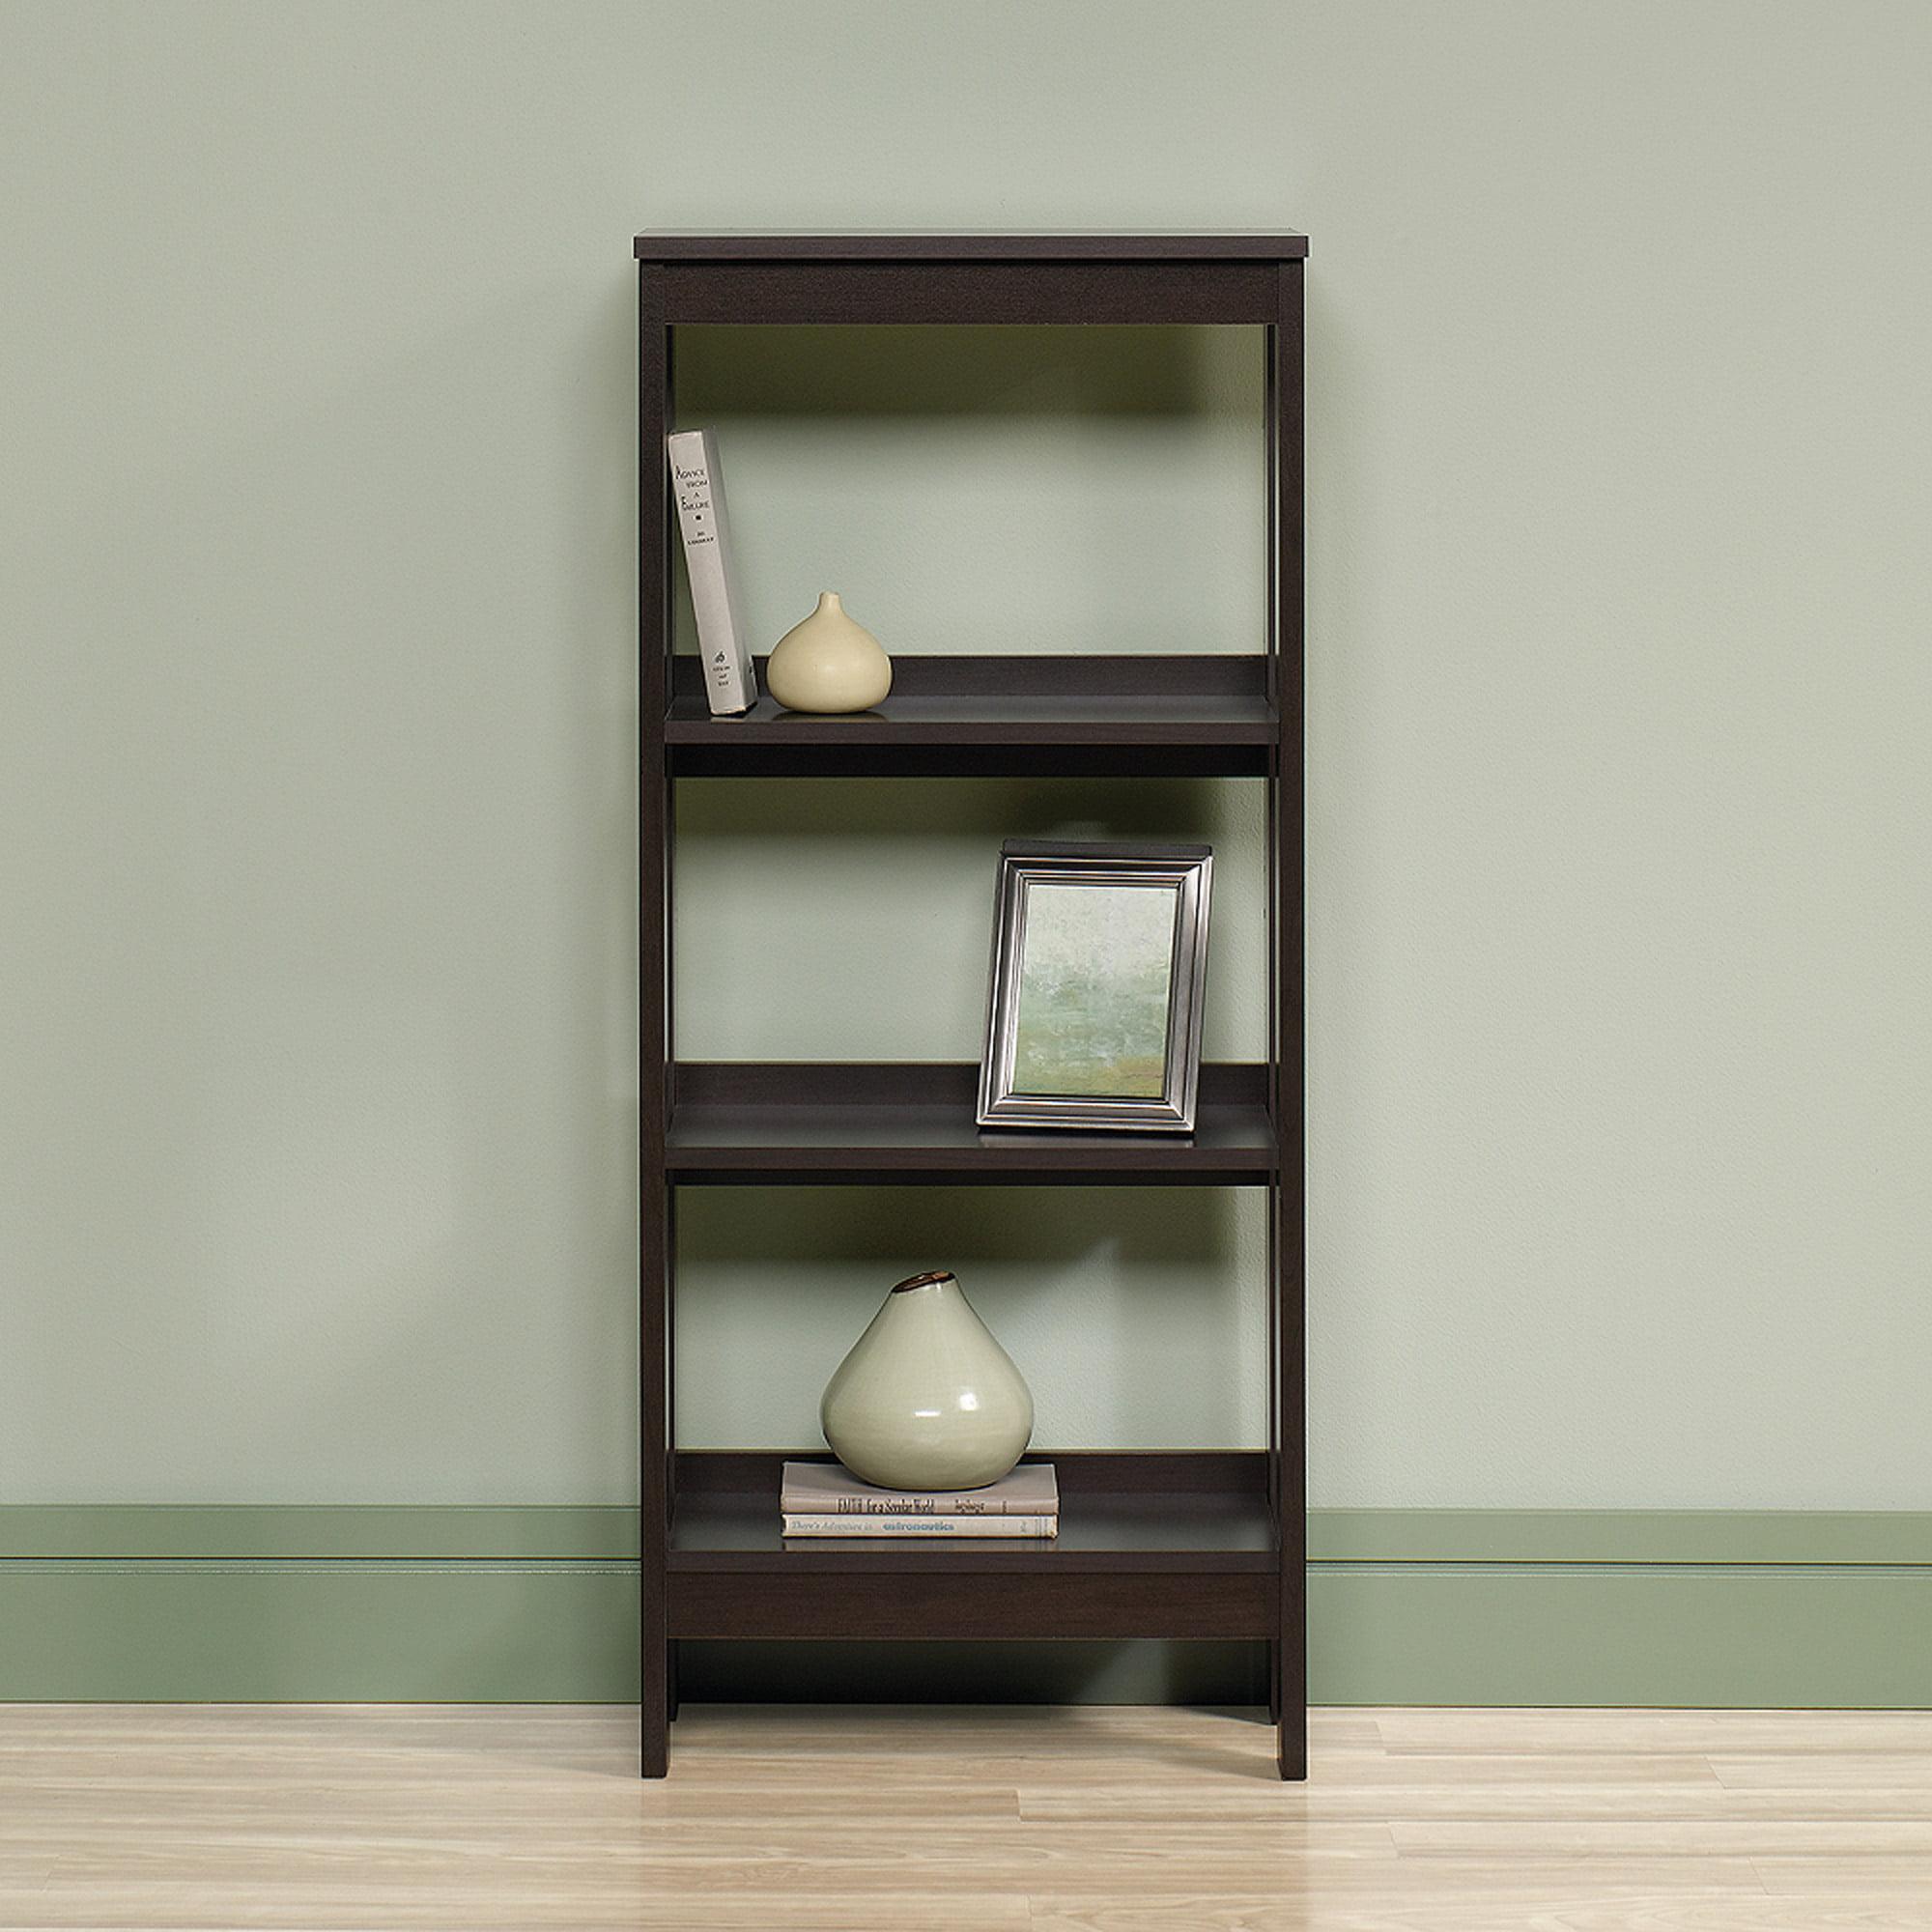 Sauder Beginnings 3-Shelf Bookcase, Cinnamon Cherry Finish - Walmart